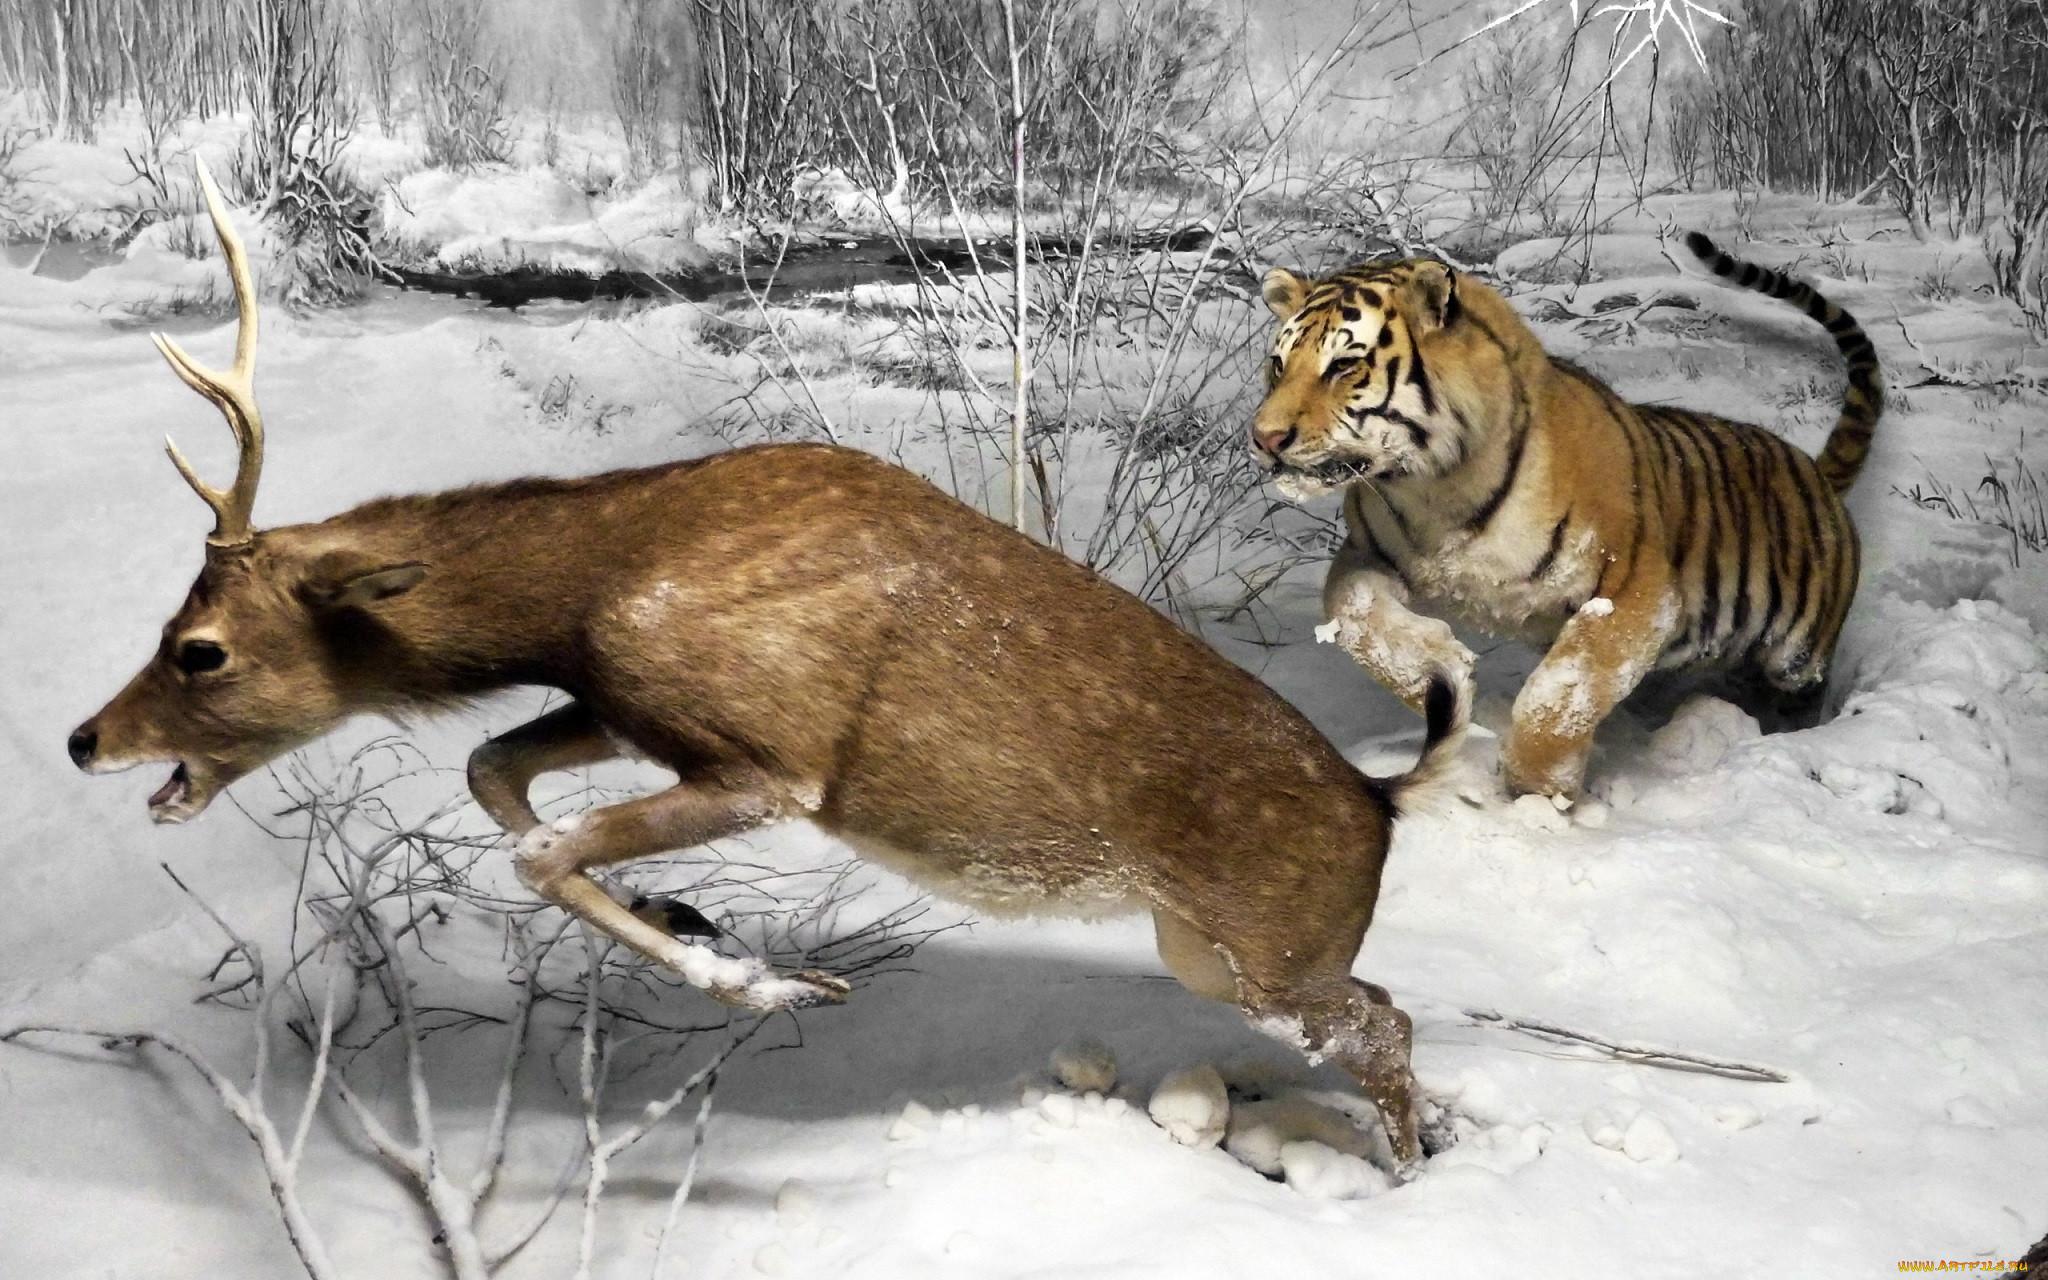 рисованное, животные, museo, di, storia, naturale, олень, тигр, animal, milano